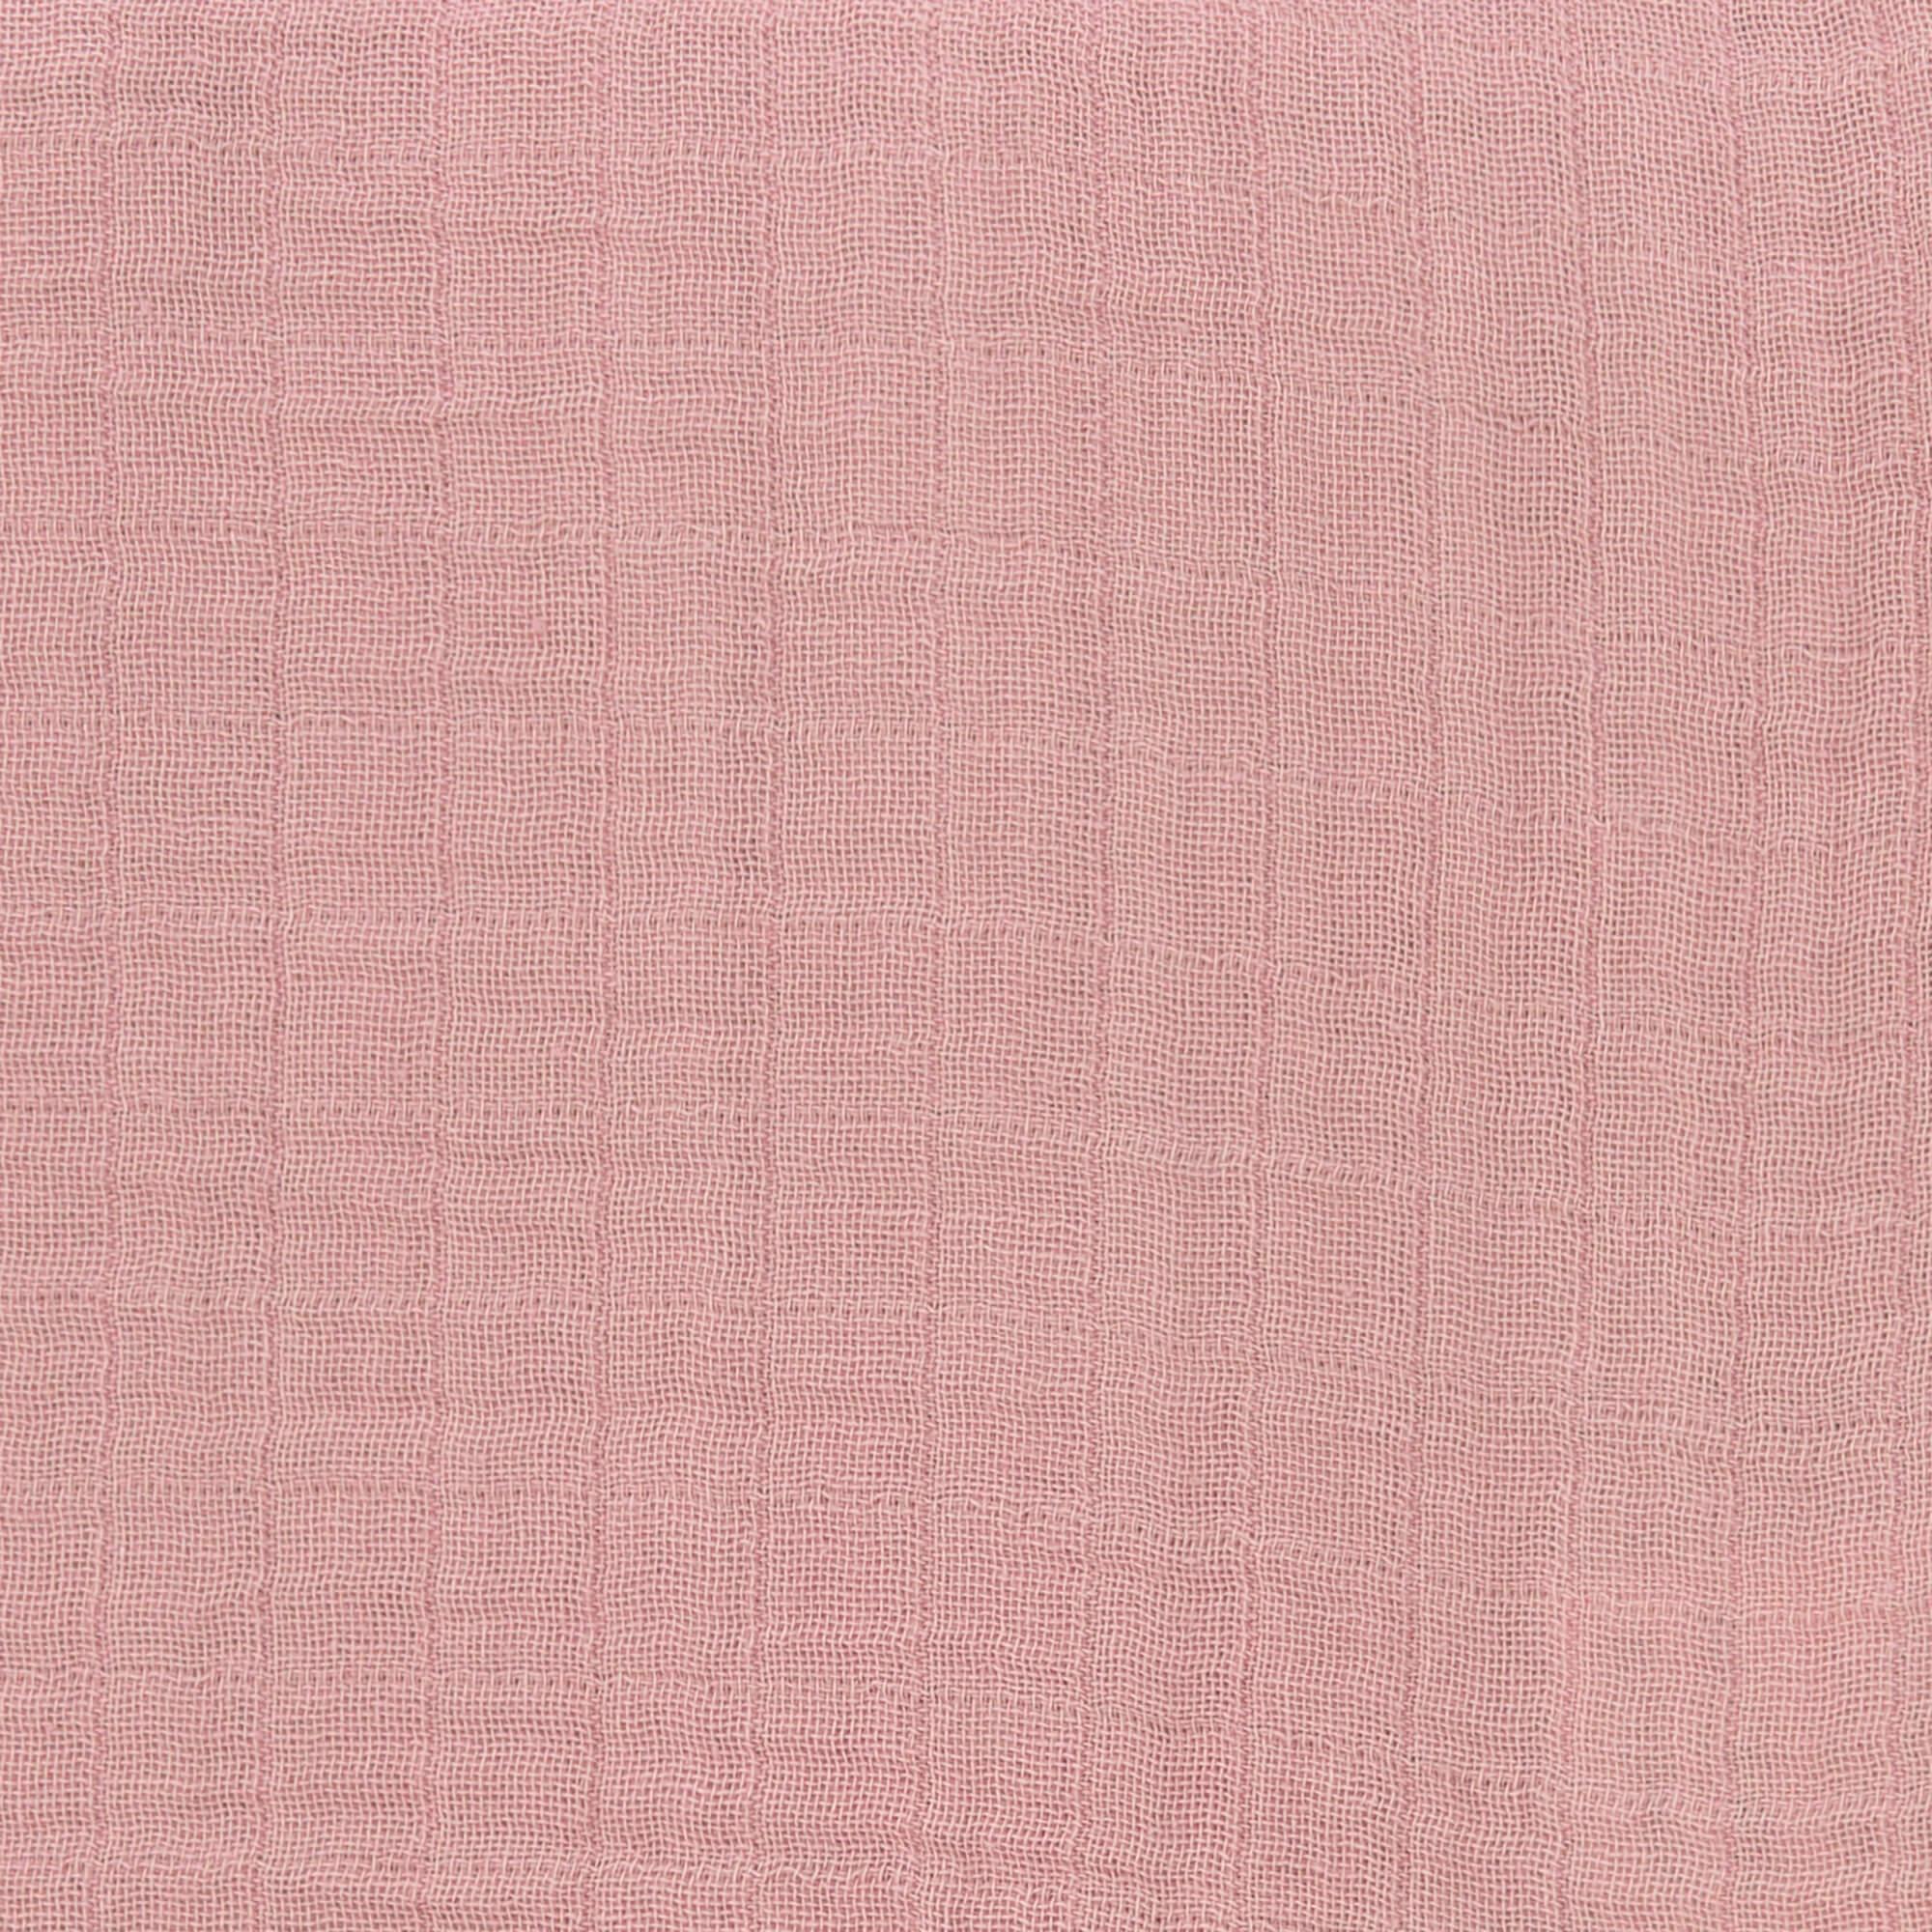 Stillschal Musselin - Rose - Lässig